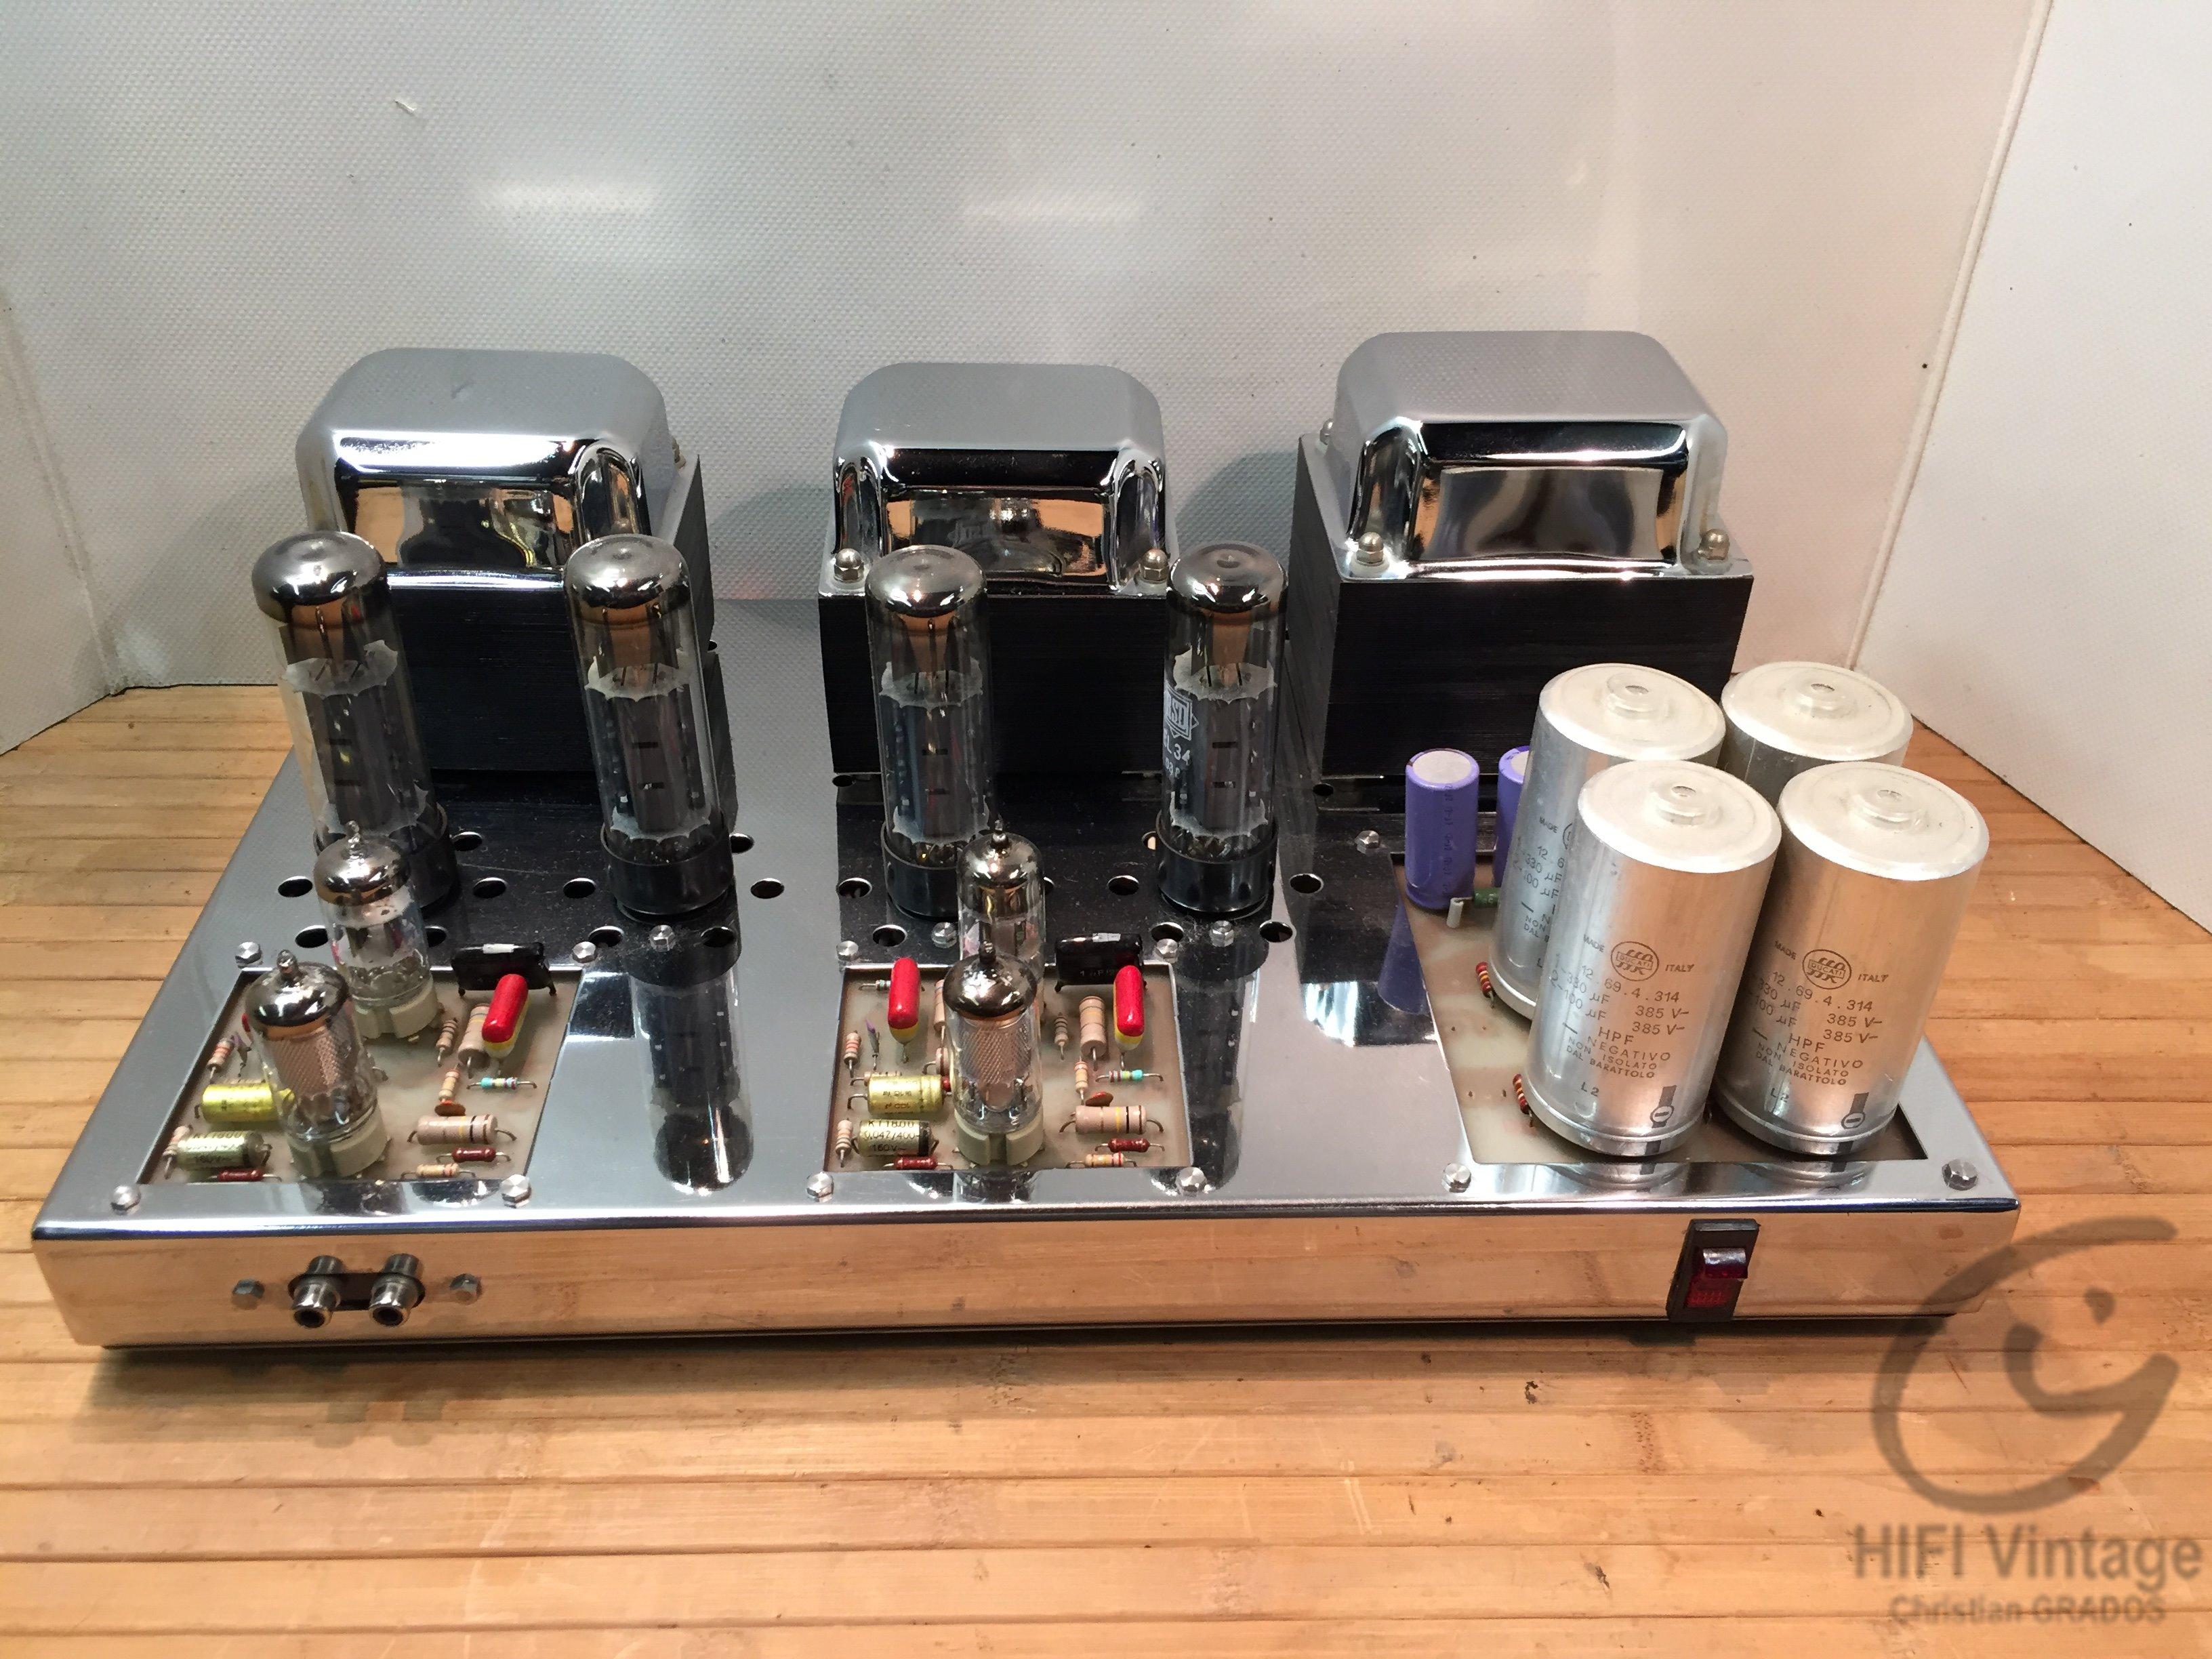 AMPLITON TS-3500 Hifi vintage réparations